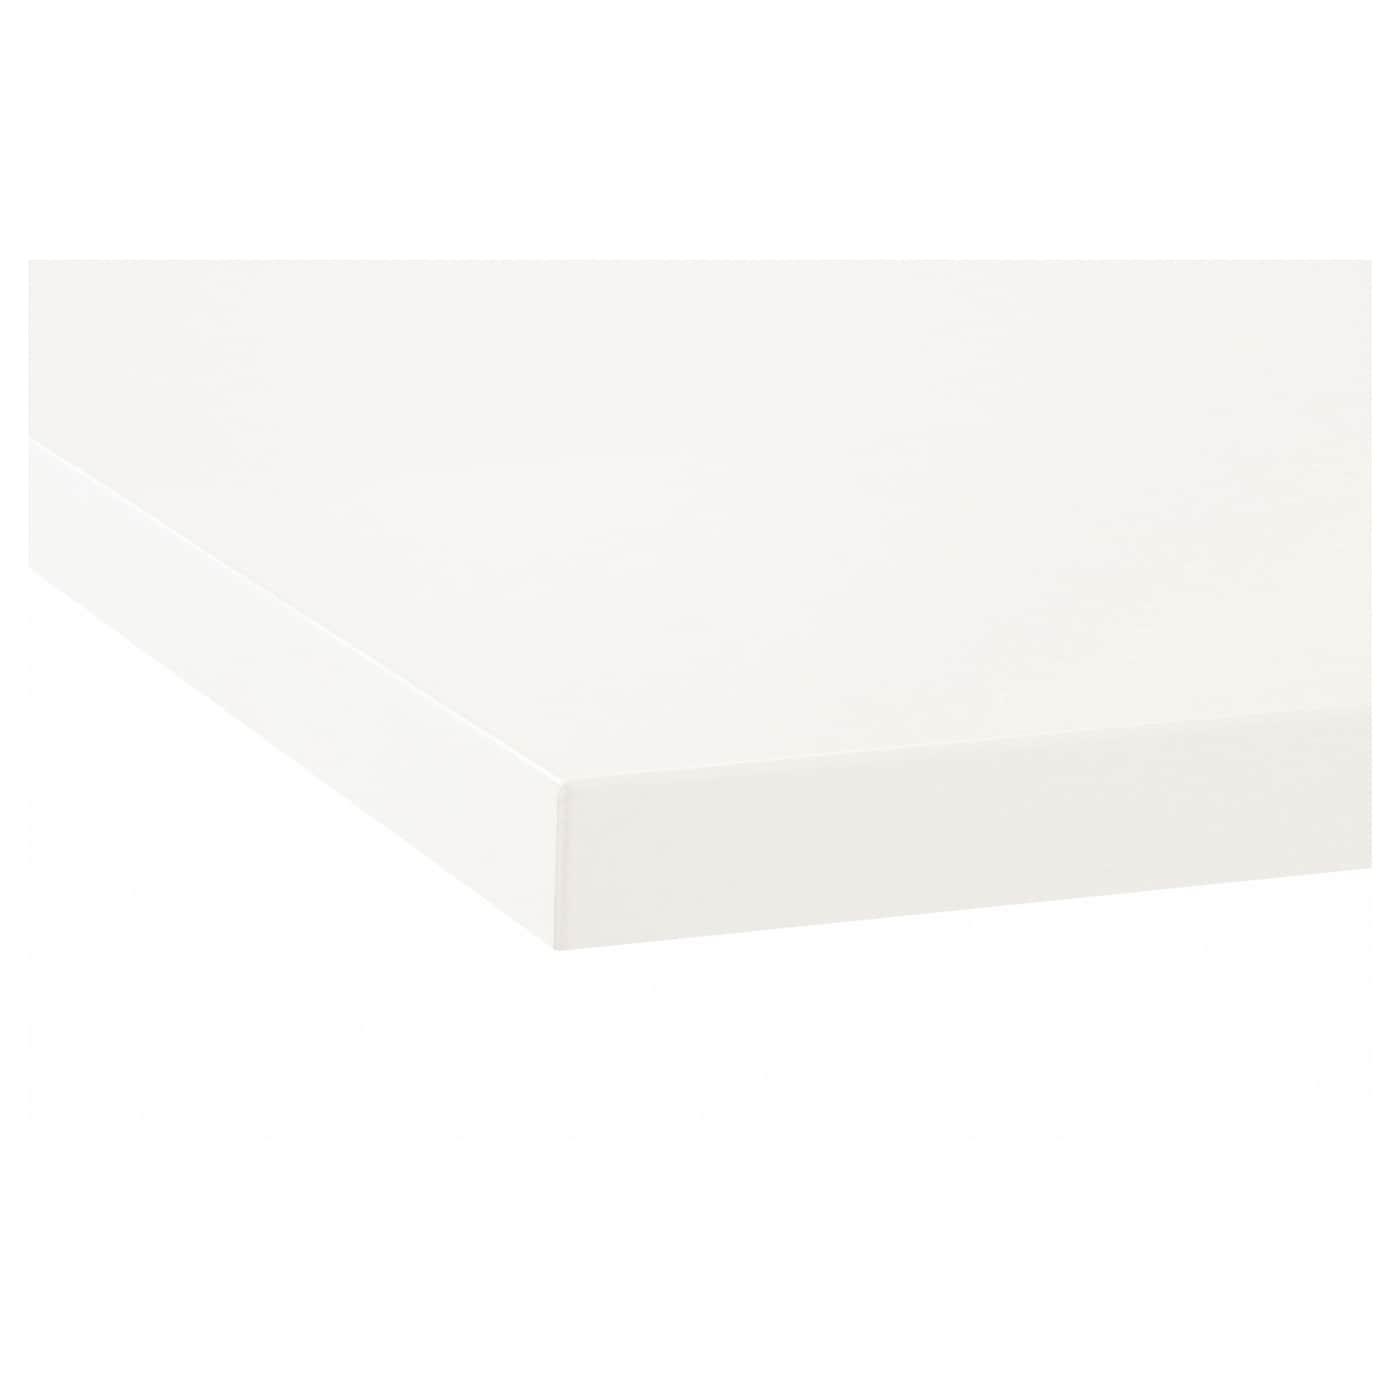 Laminated Flooring Off White : White laminate flooring ikea